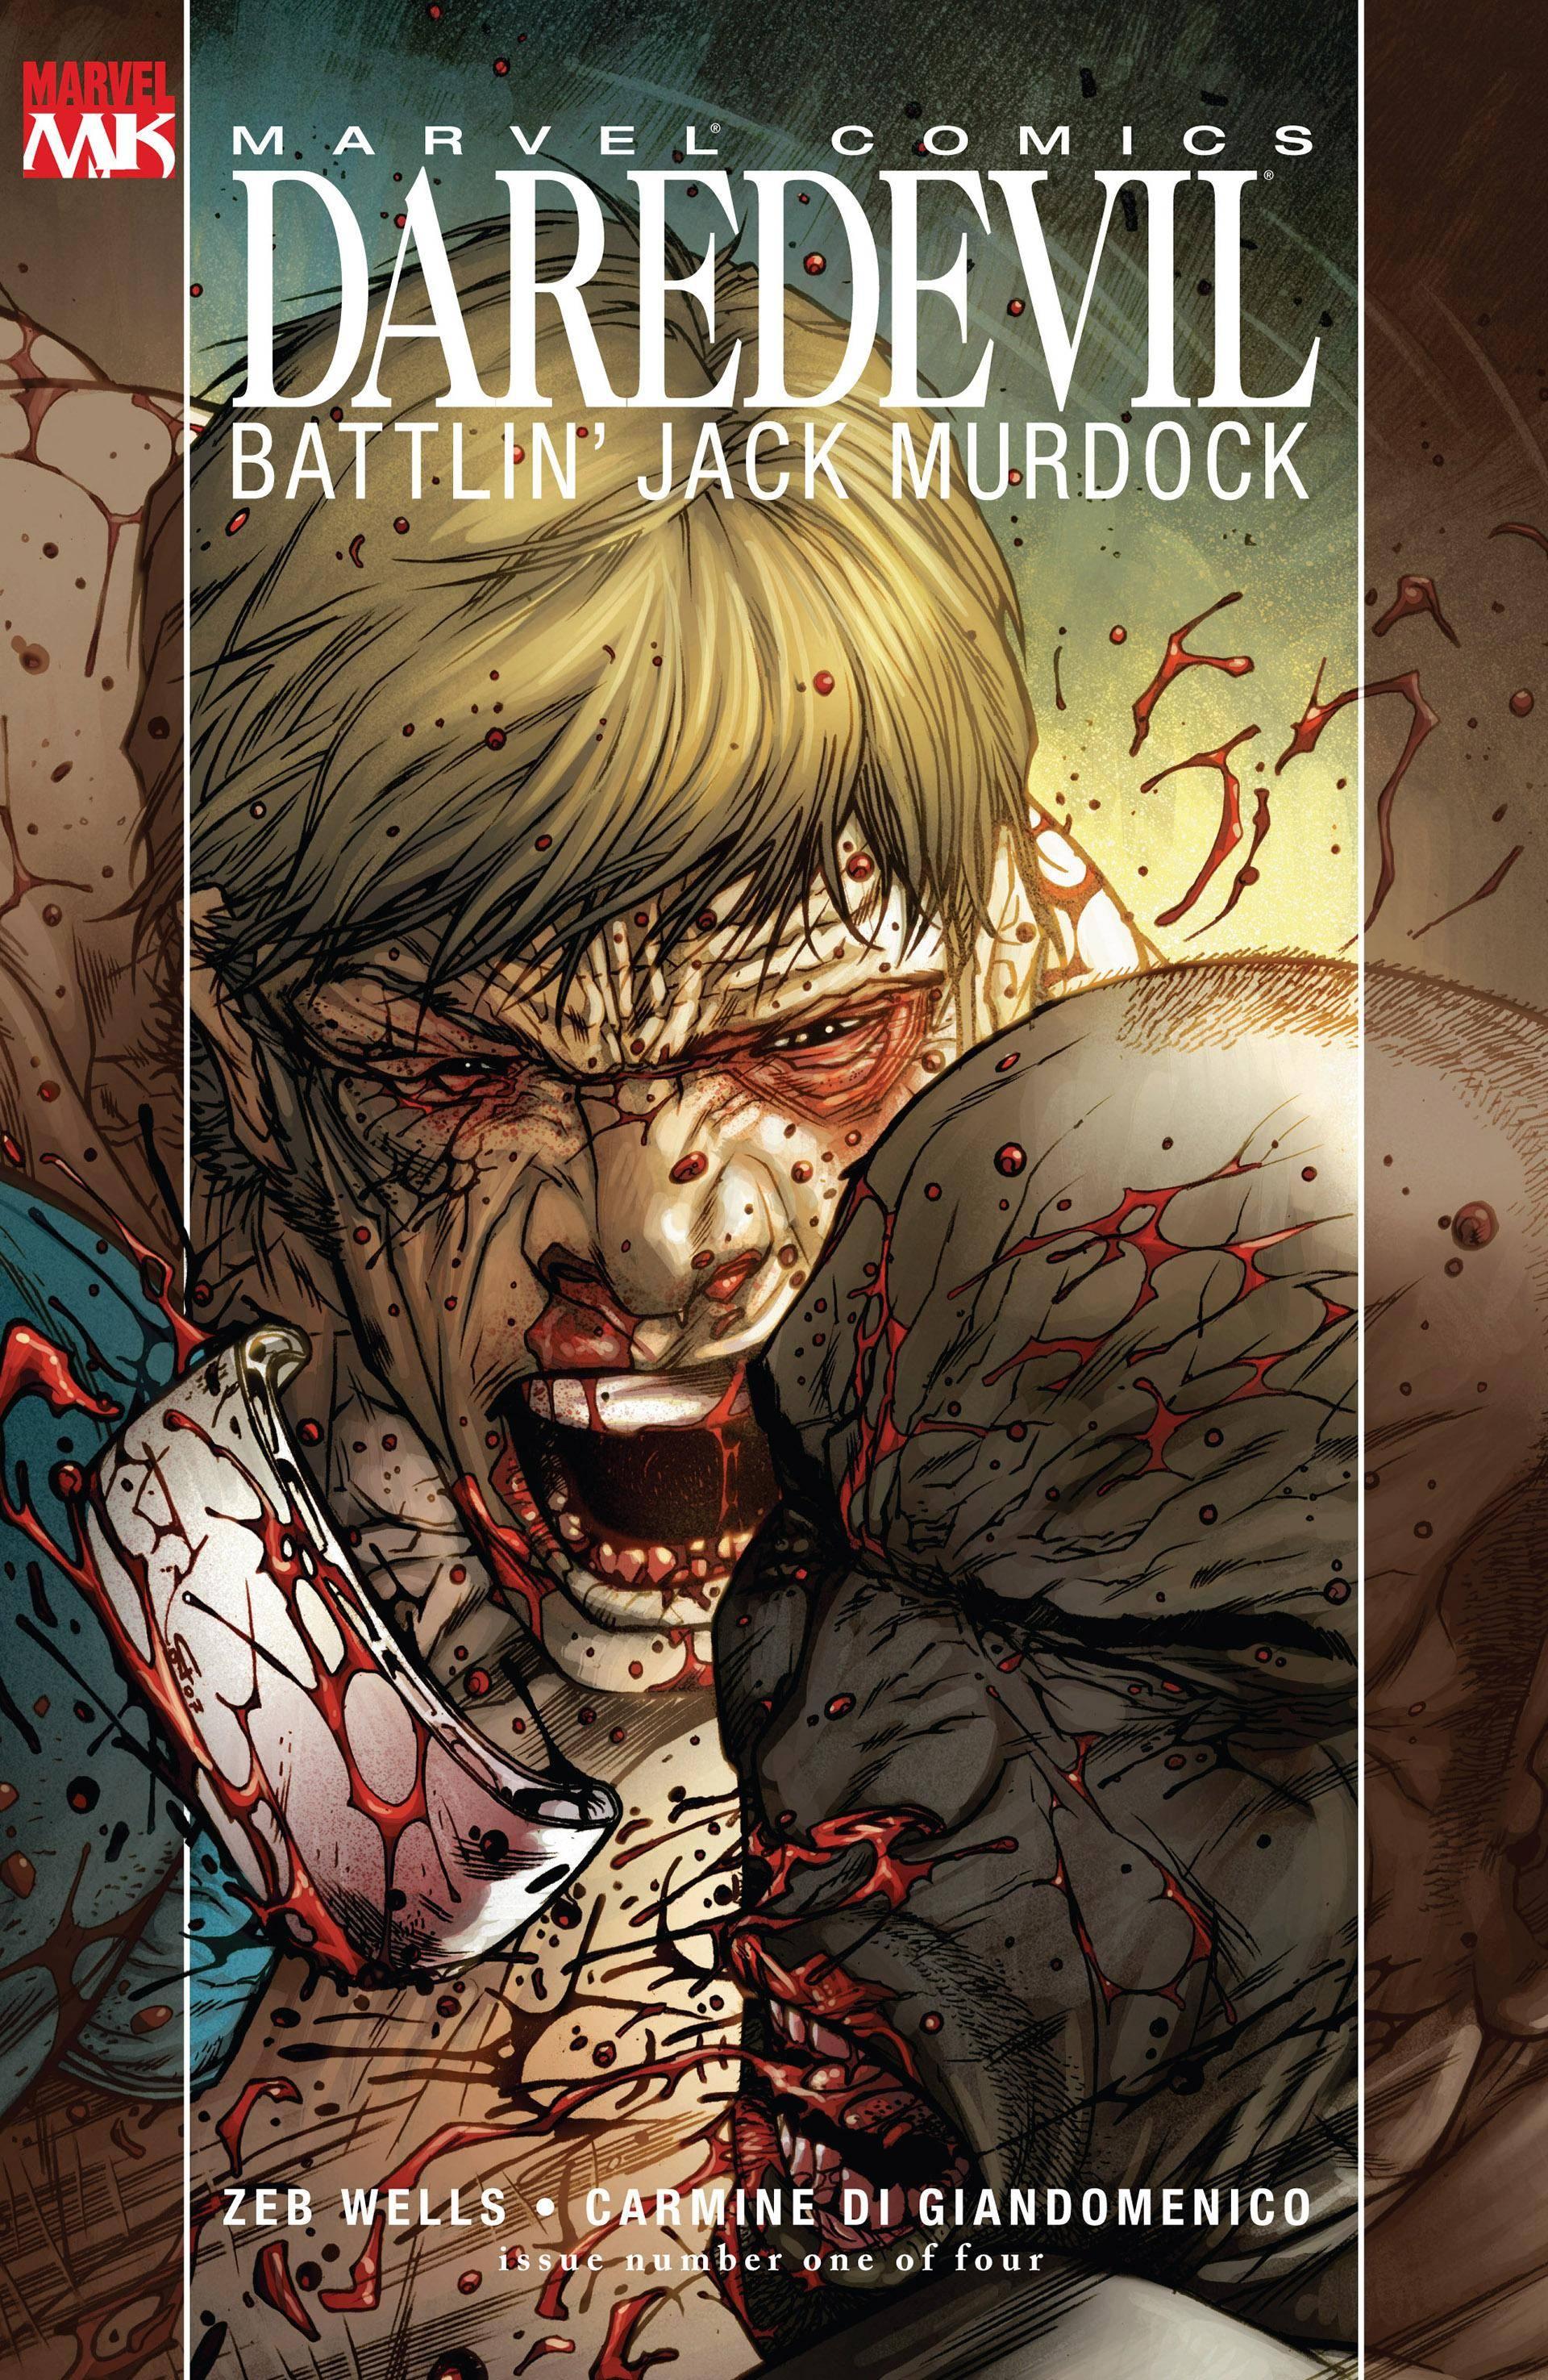 Daredevil Battlin Jack Murdock 01 of 4 2007 Digital